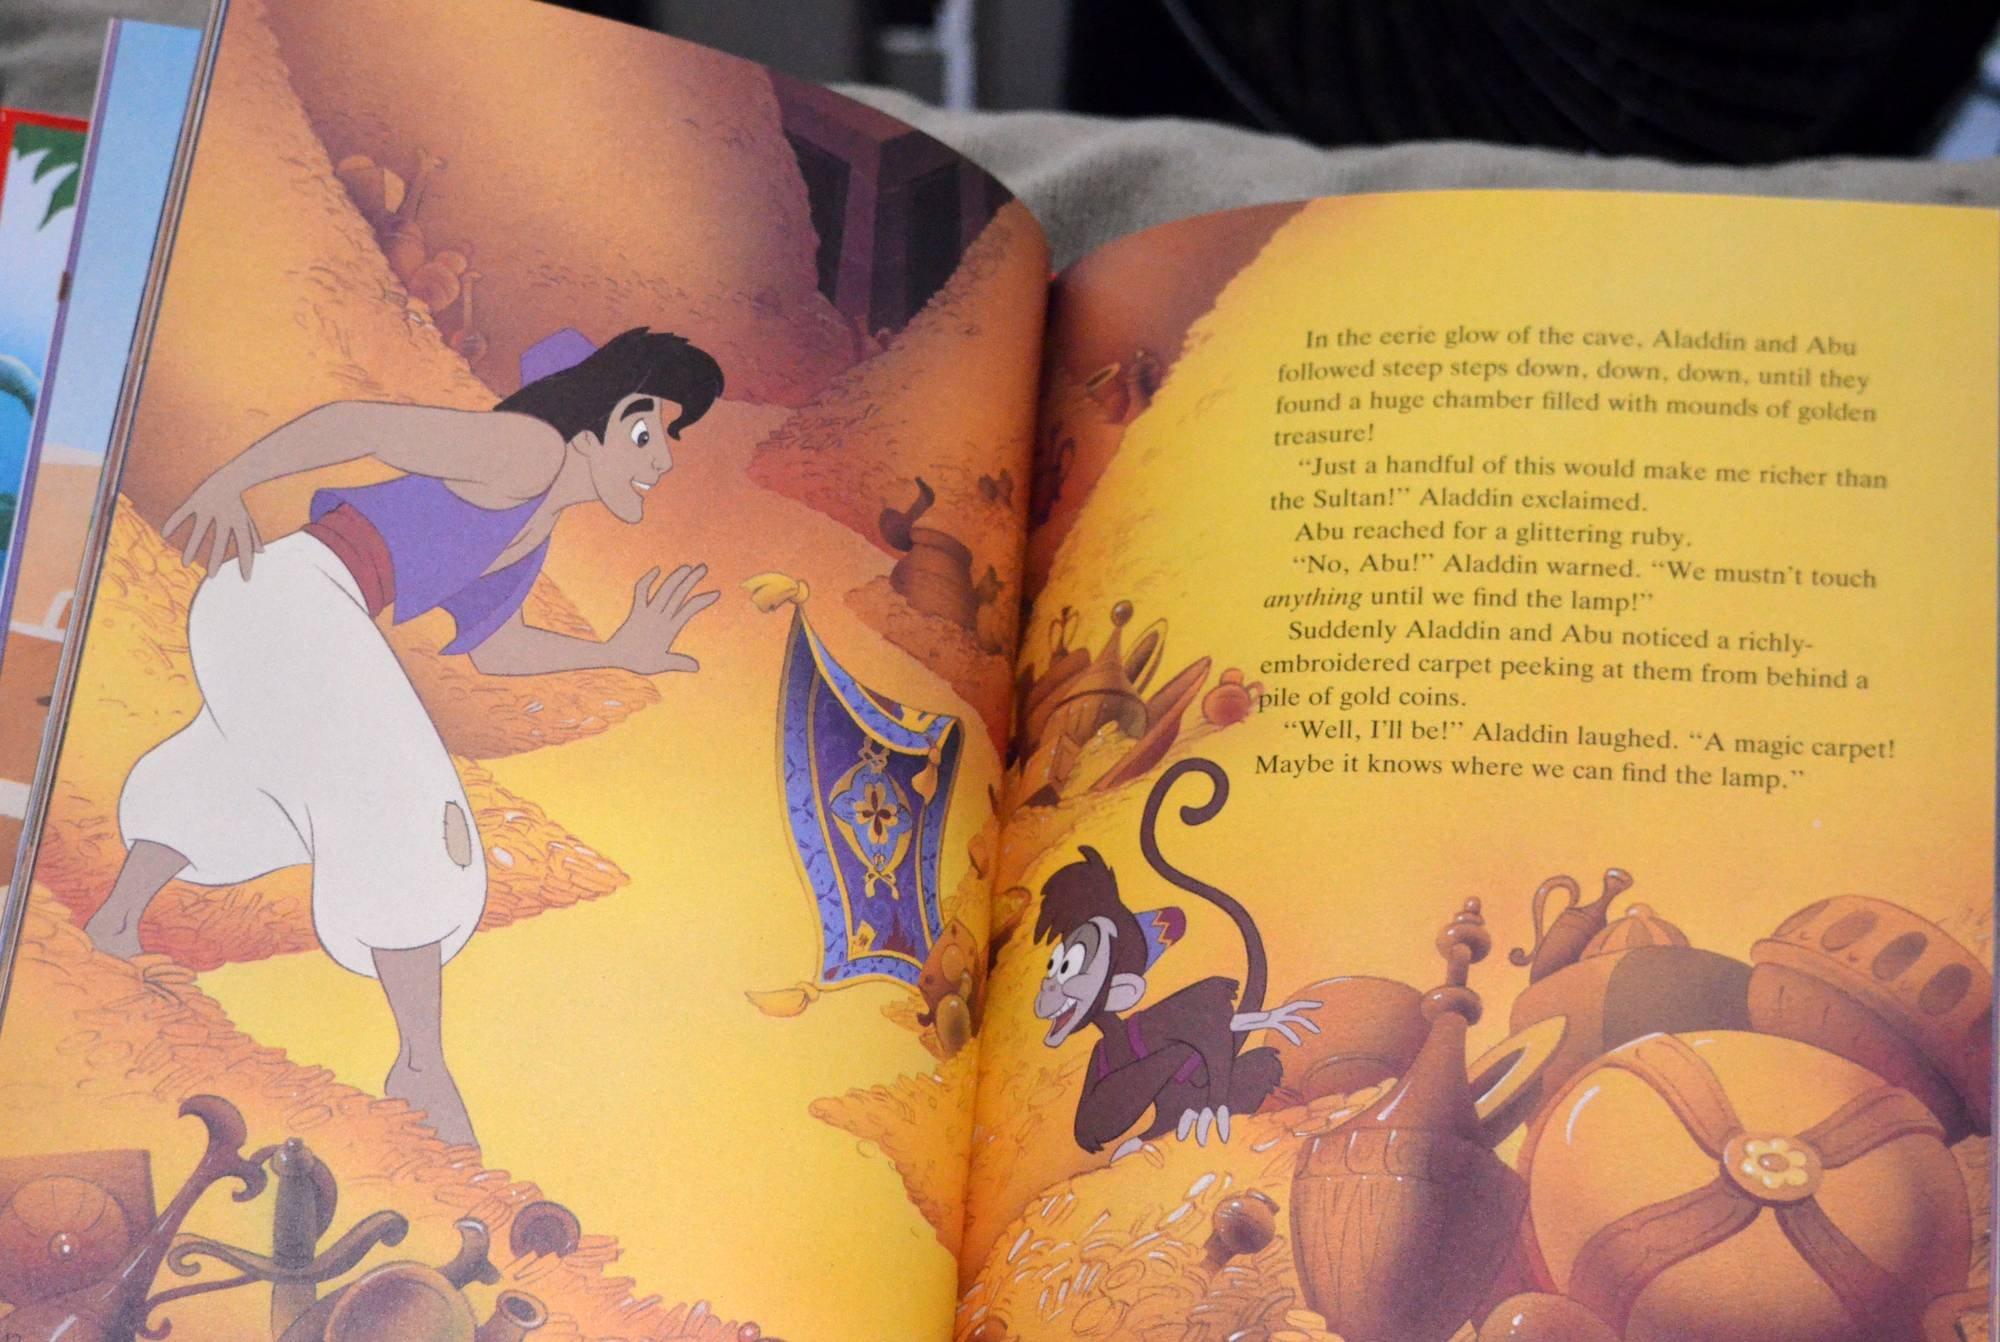 Disneys Aladdin Disney Classic Series Edition First Amazonco Story Books Of Aladin Don Ferguson 9781854699466